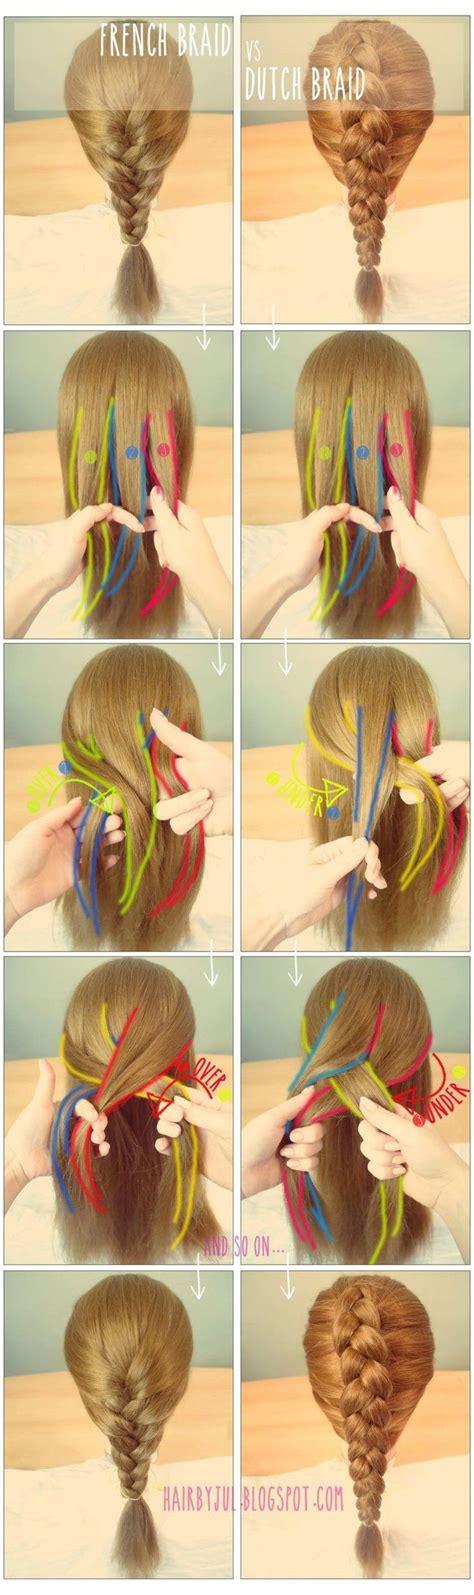 dutch braids ideas  pinterest braids double